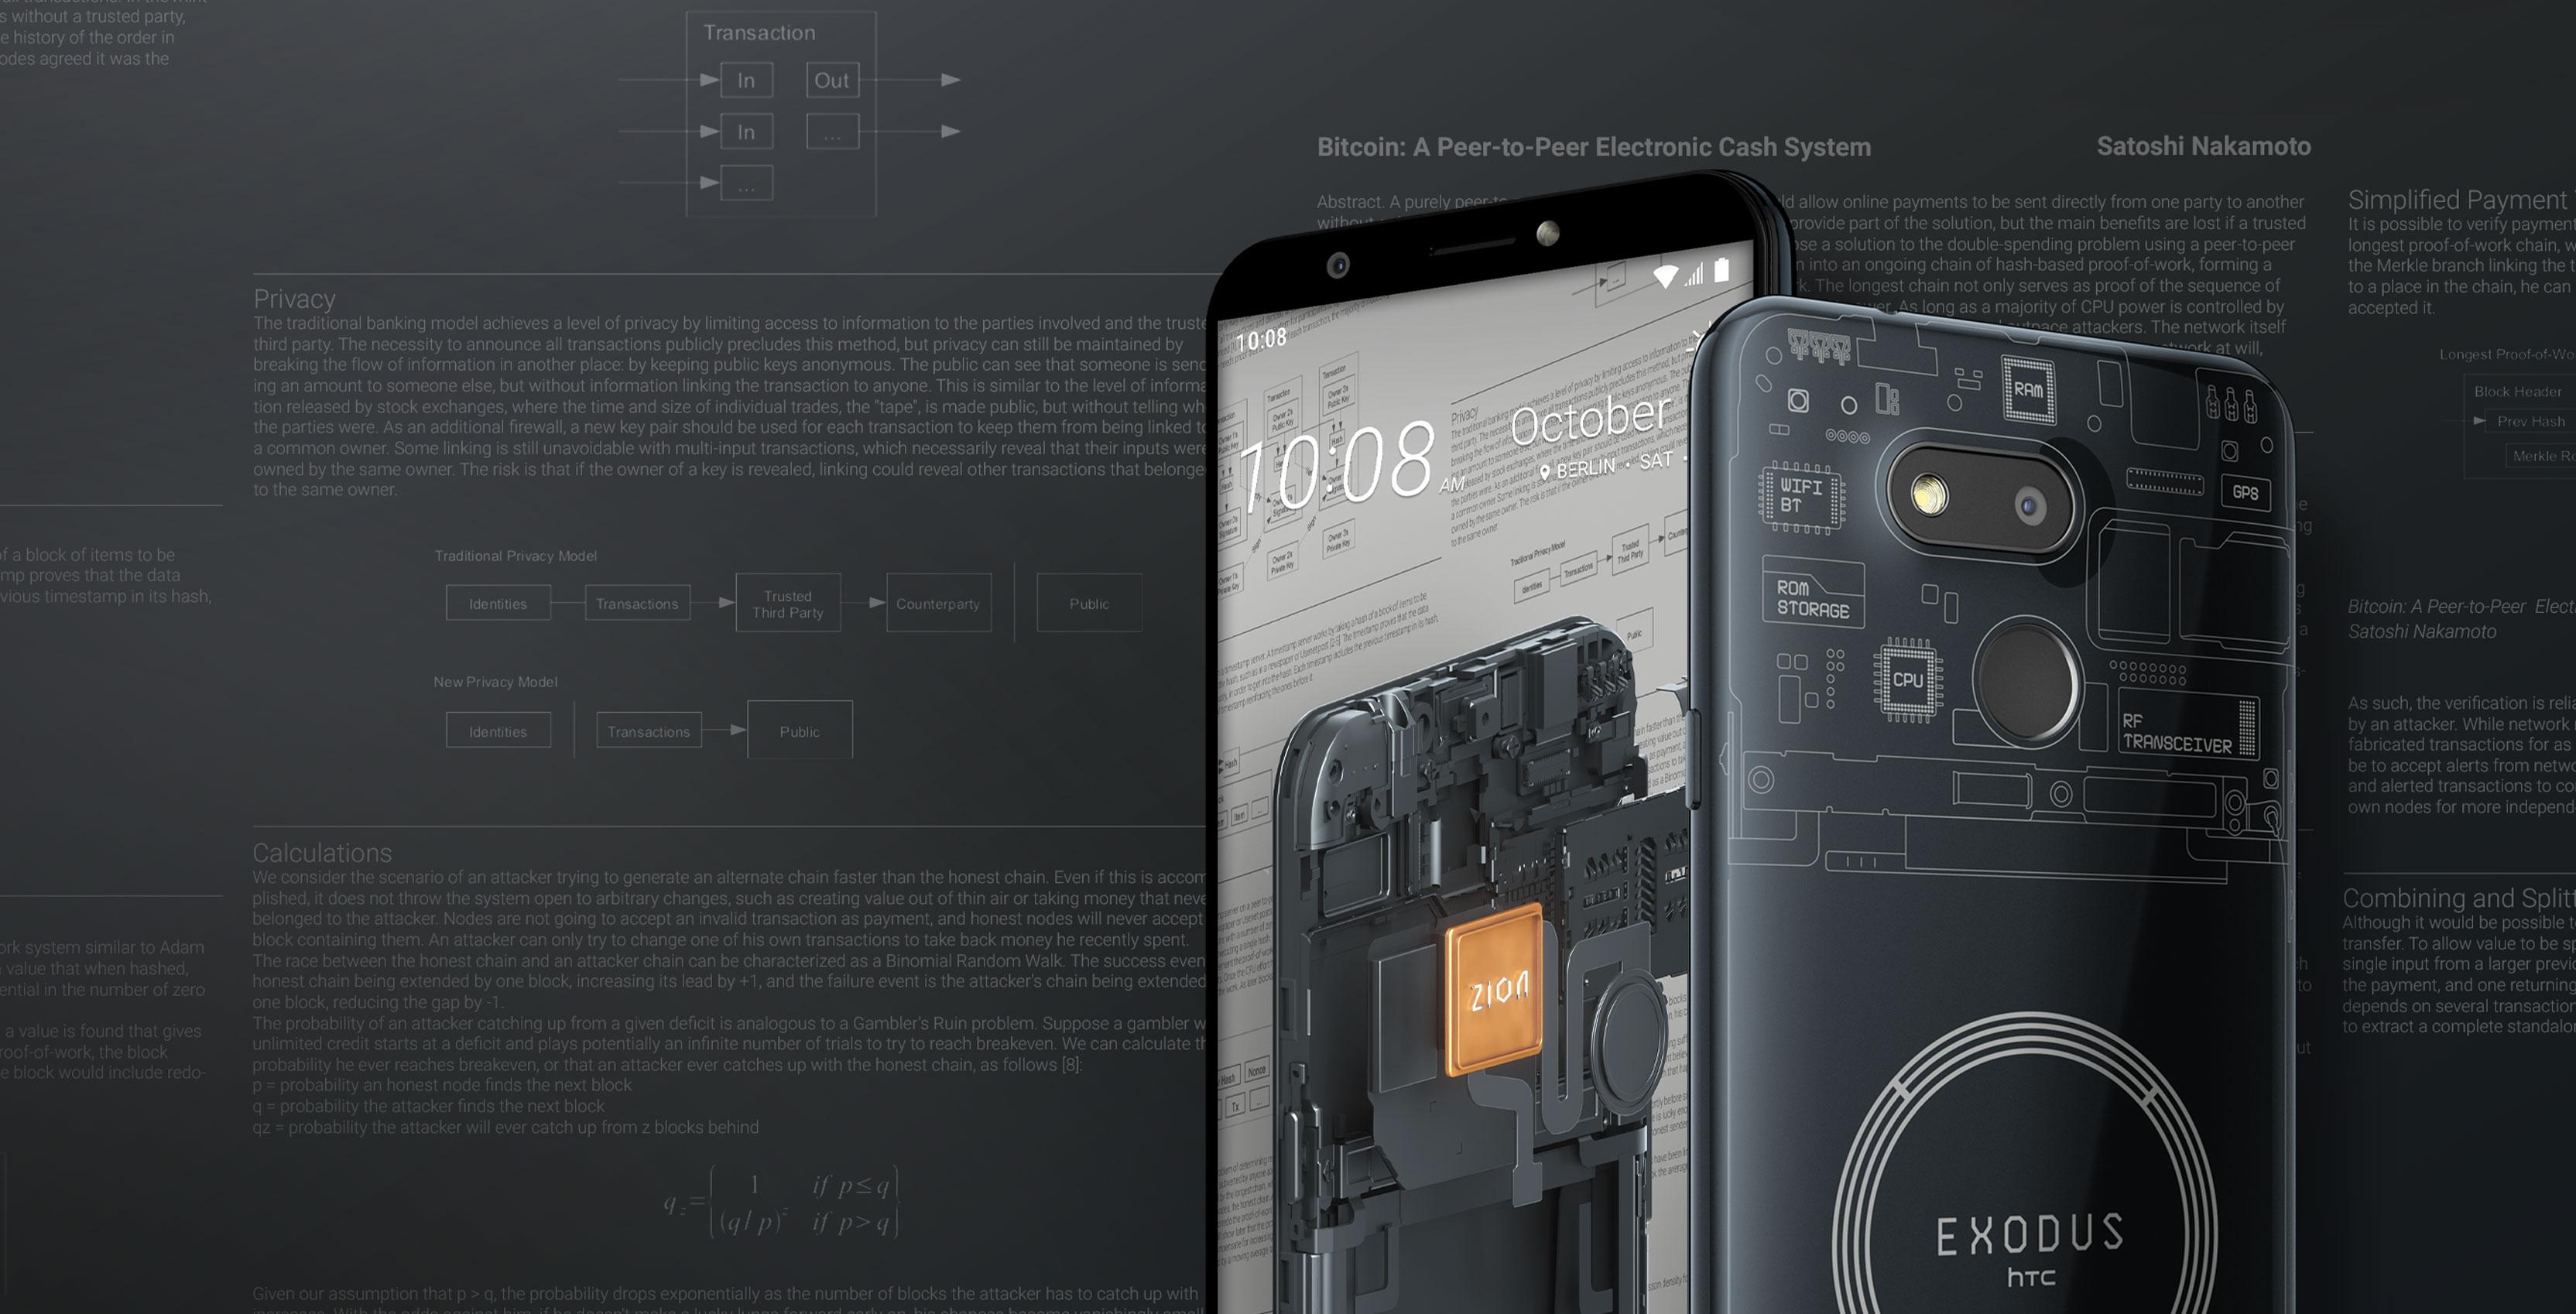 HTC announces Exodus 1s cryptocurrency smartphone